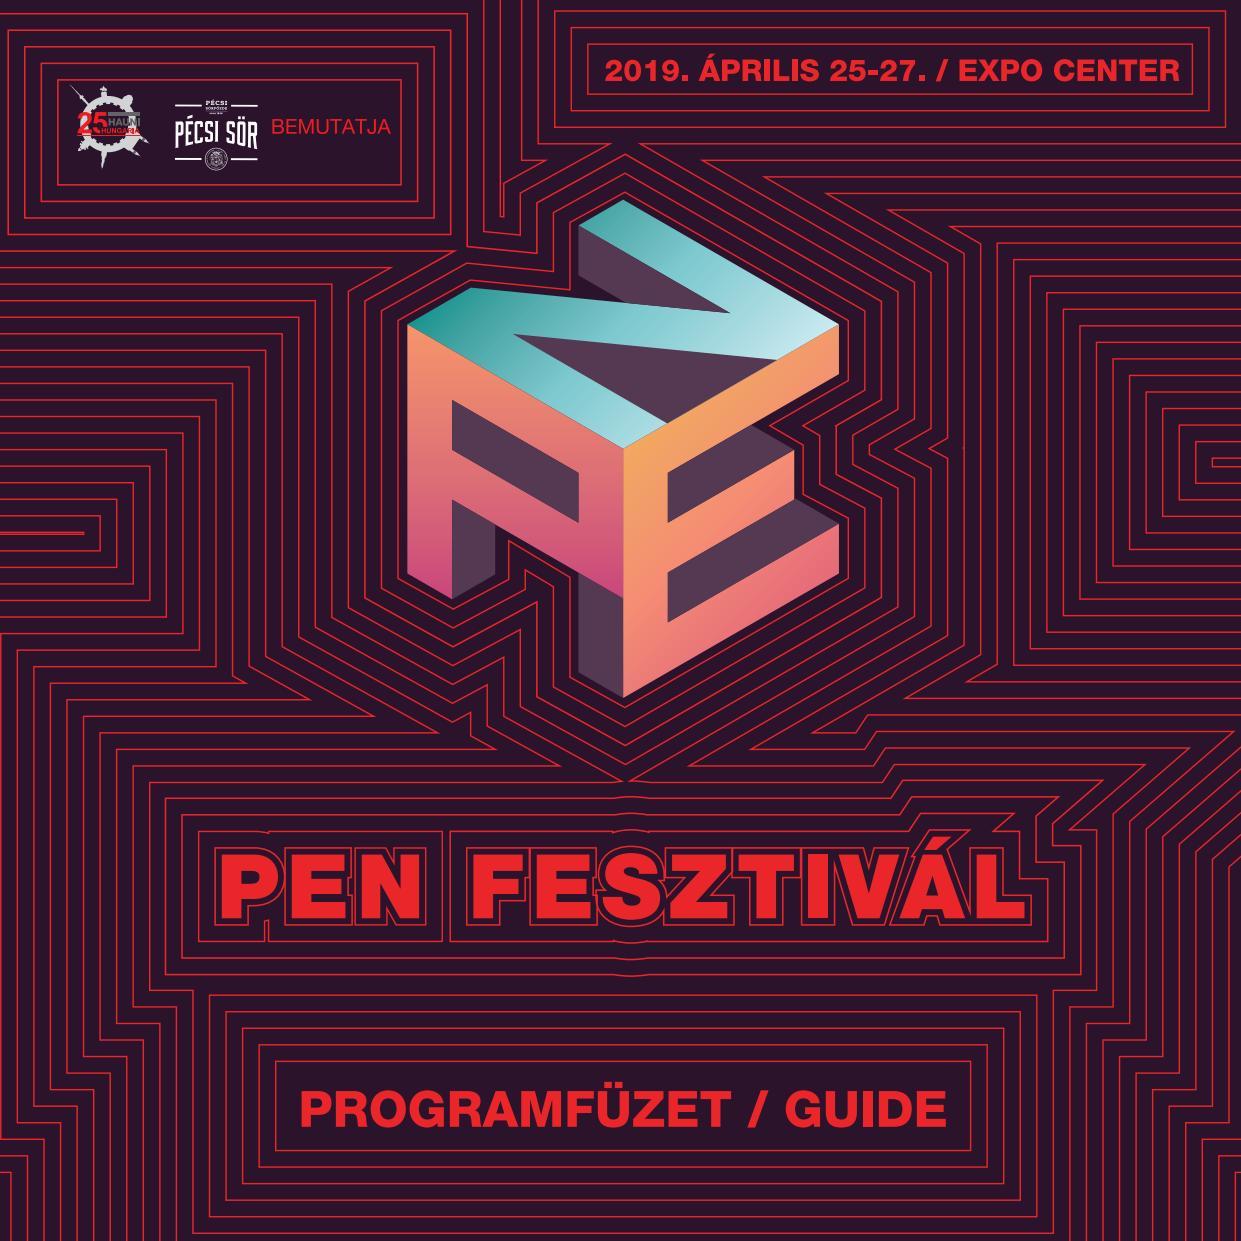 Pen Fesztival 2019 Programfuzet Pen Festival 2019 Guide By Made